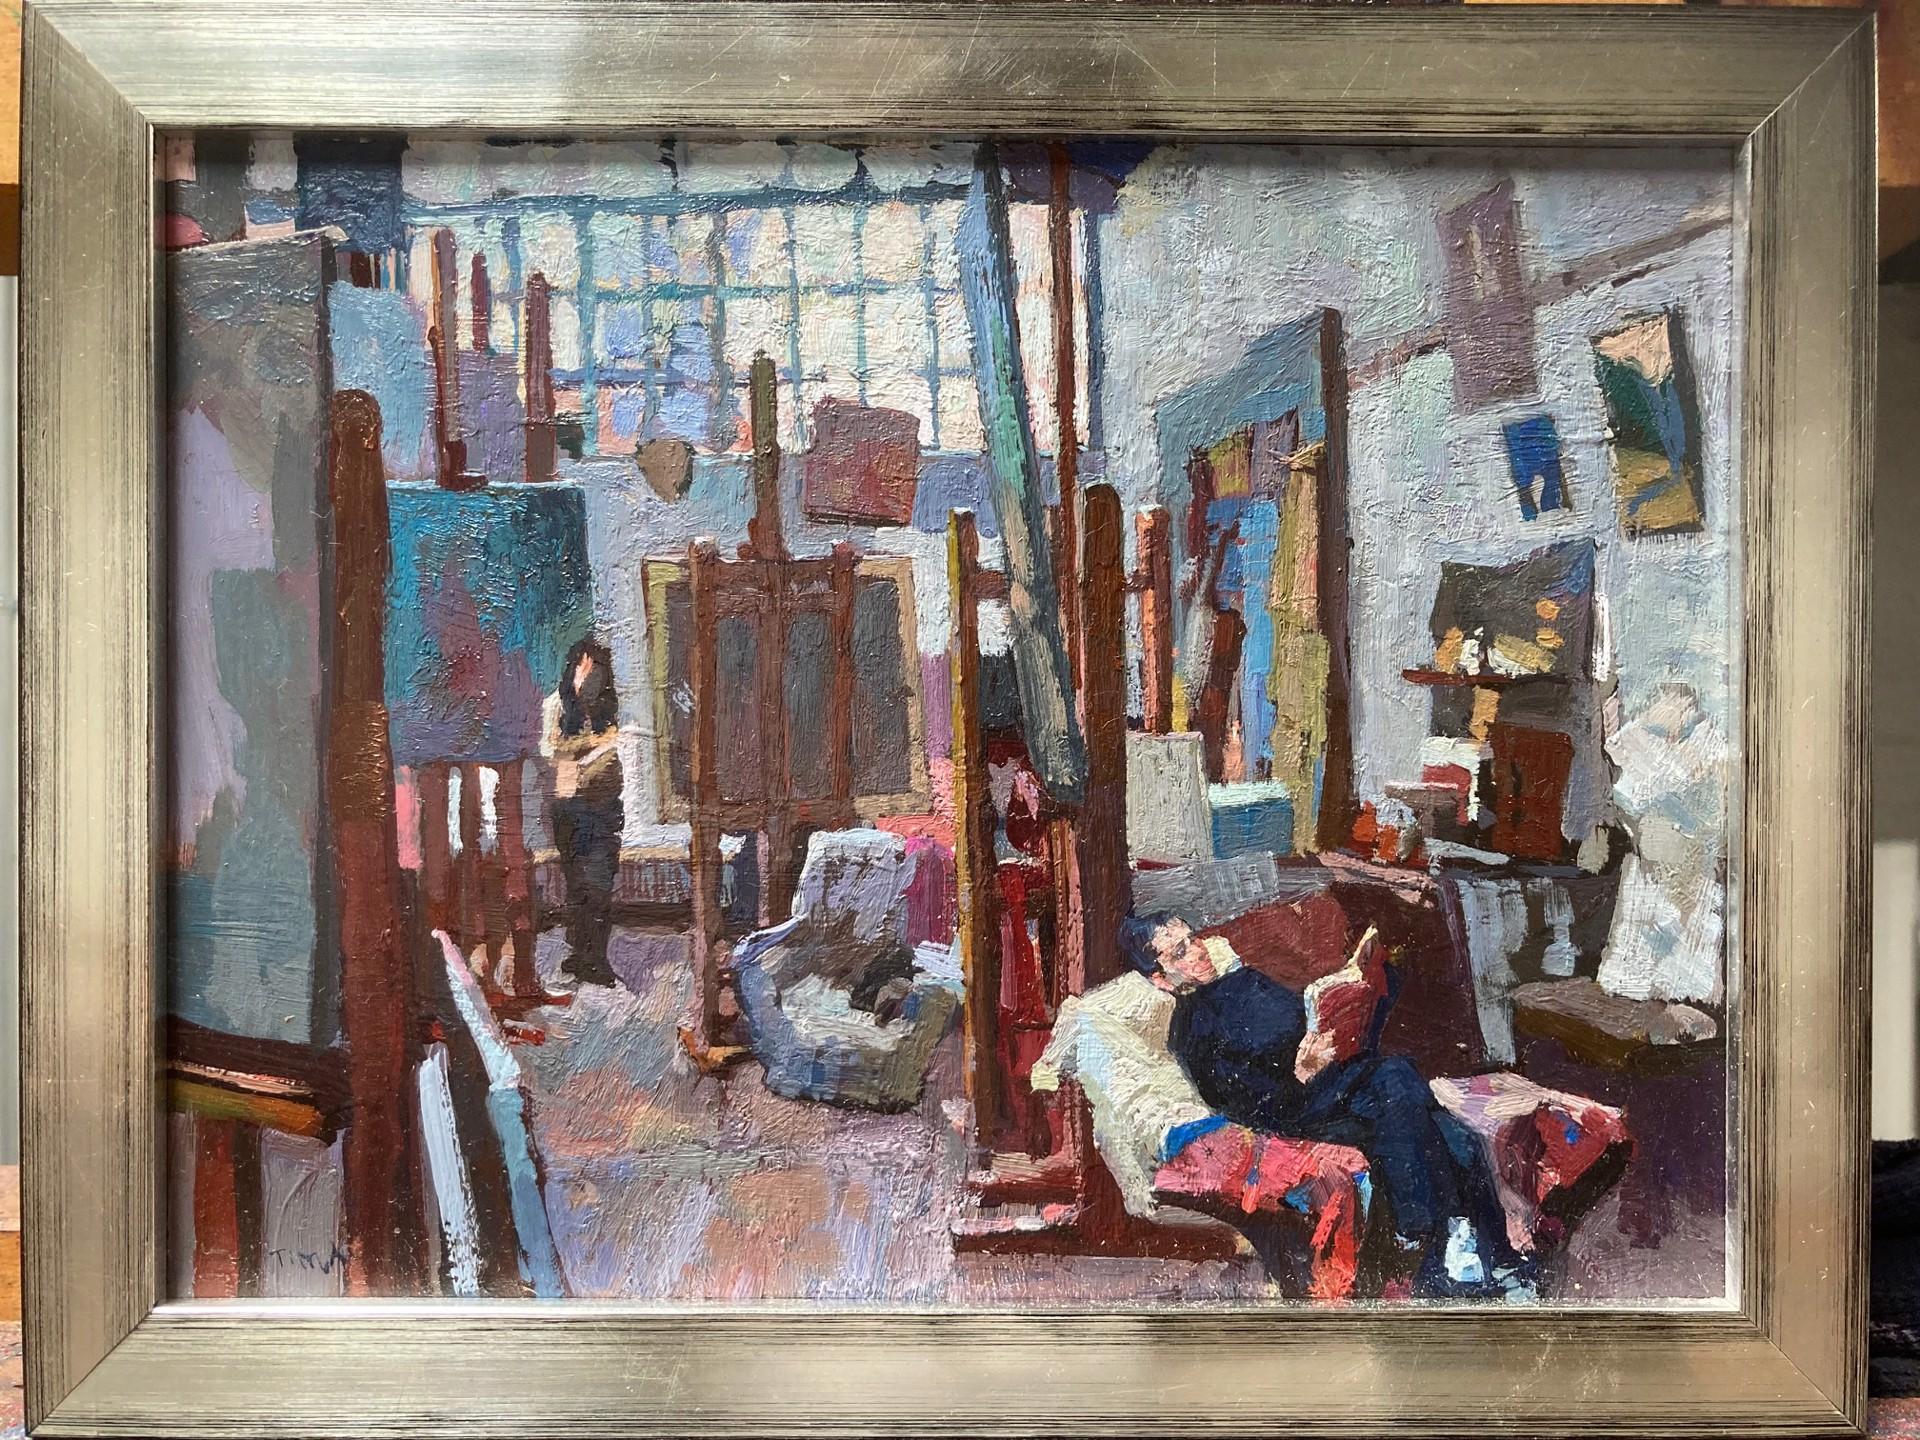 Break at the Studio by Timur Akhriev